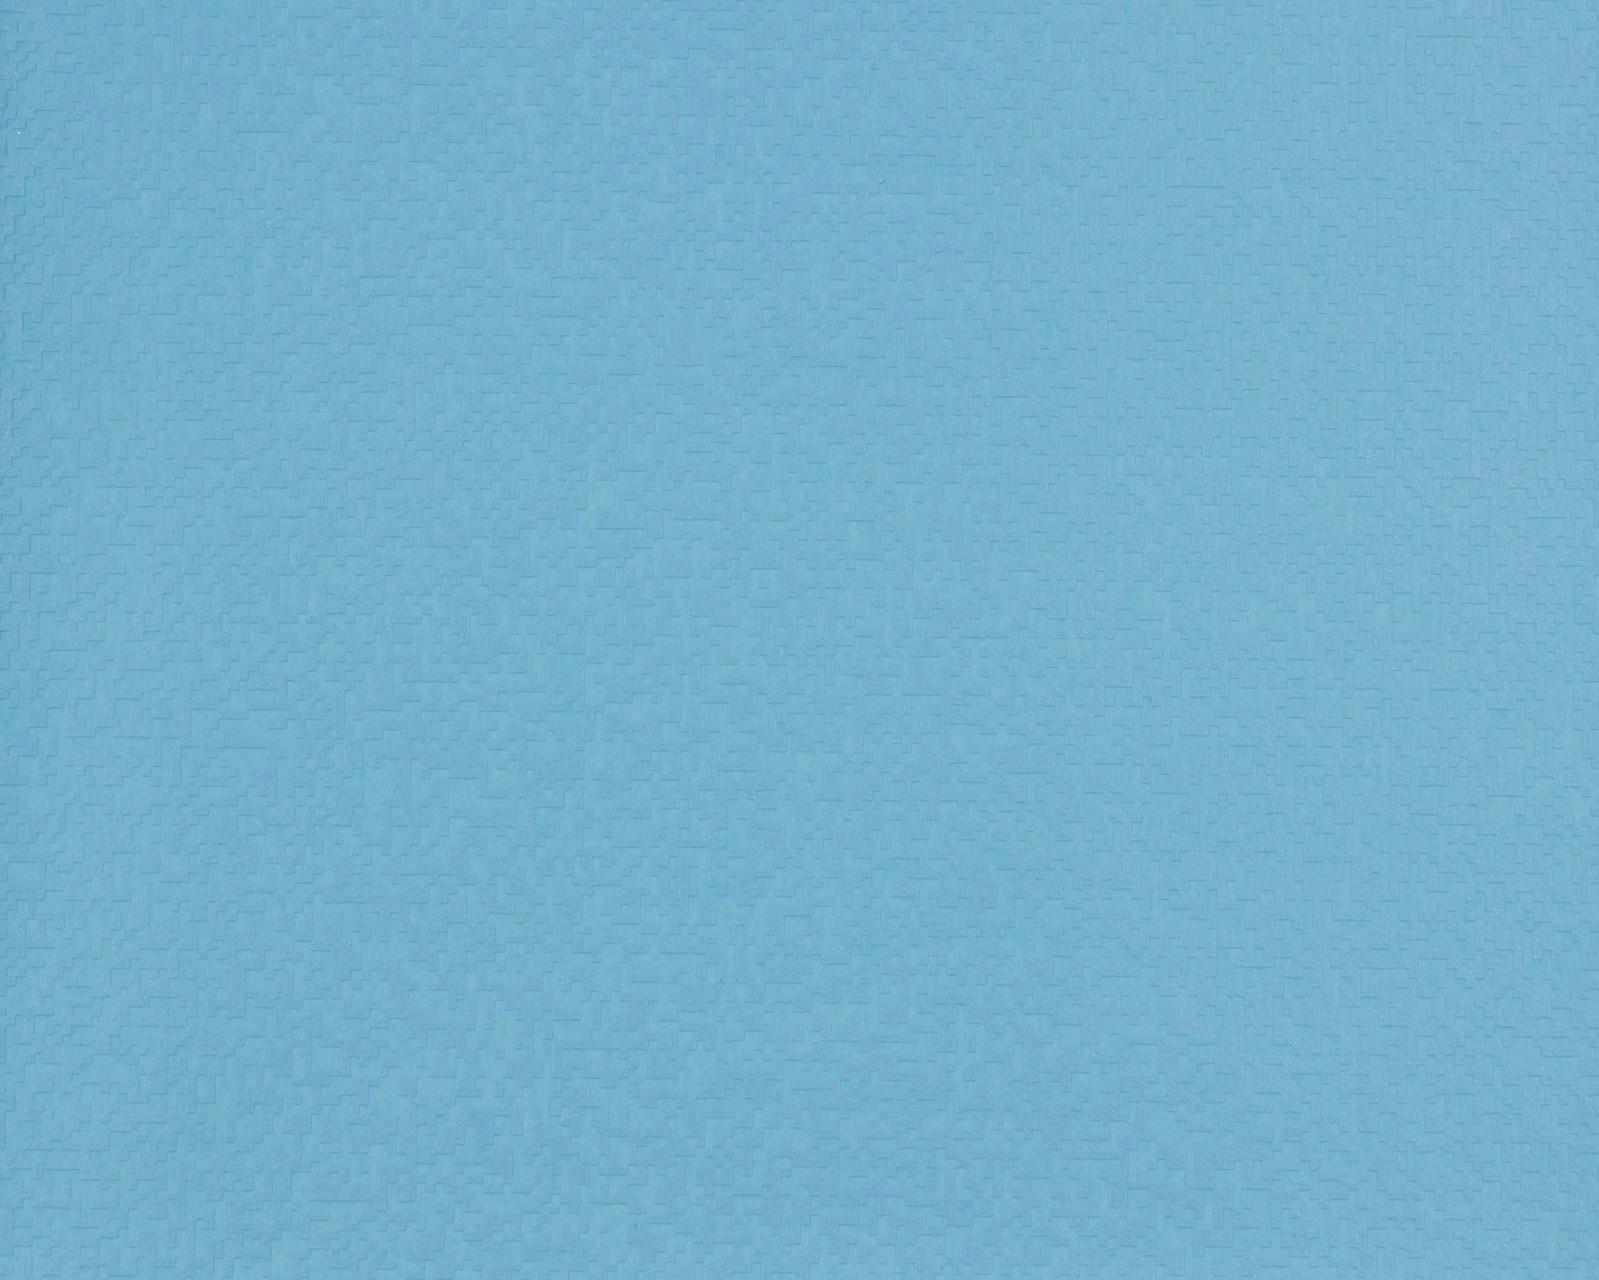 tapete rasch muster blau home vision 857702. Black Bedroom Furniture Sets. Home Design Ideas